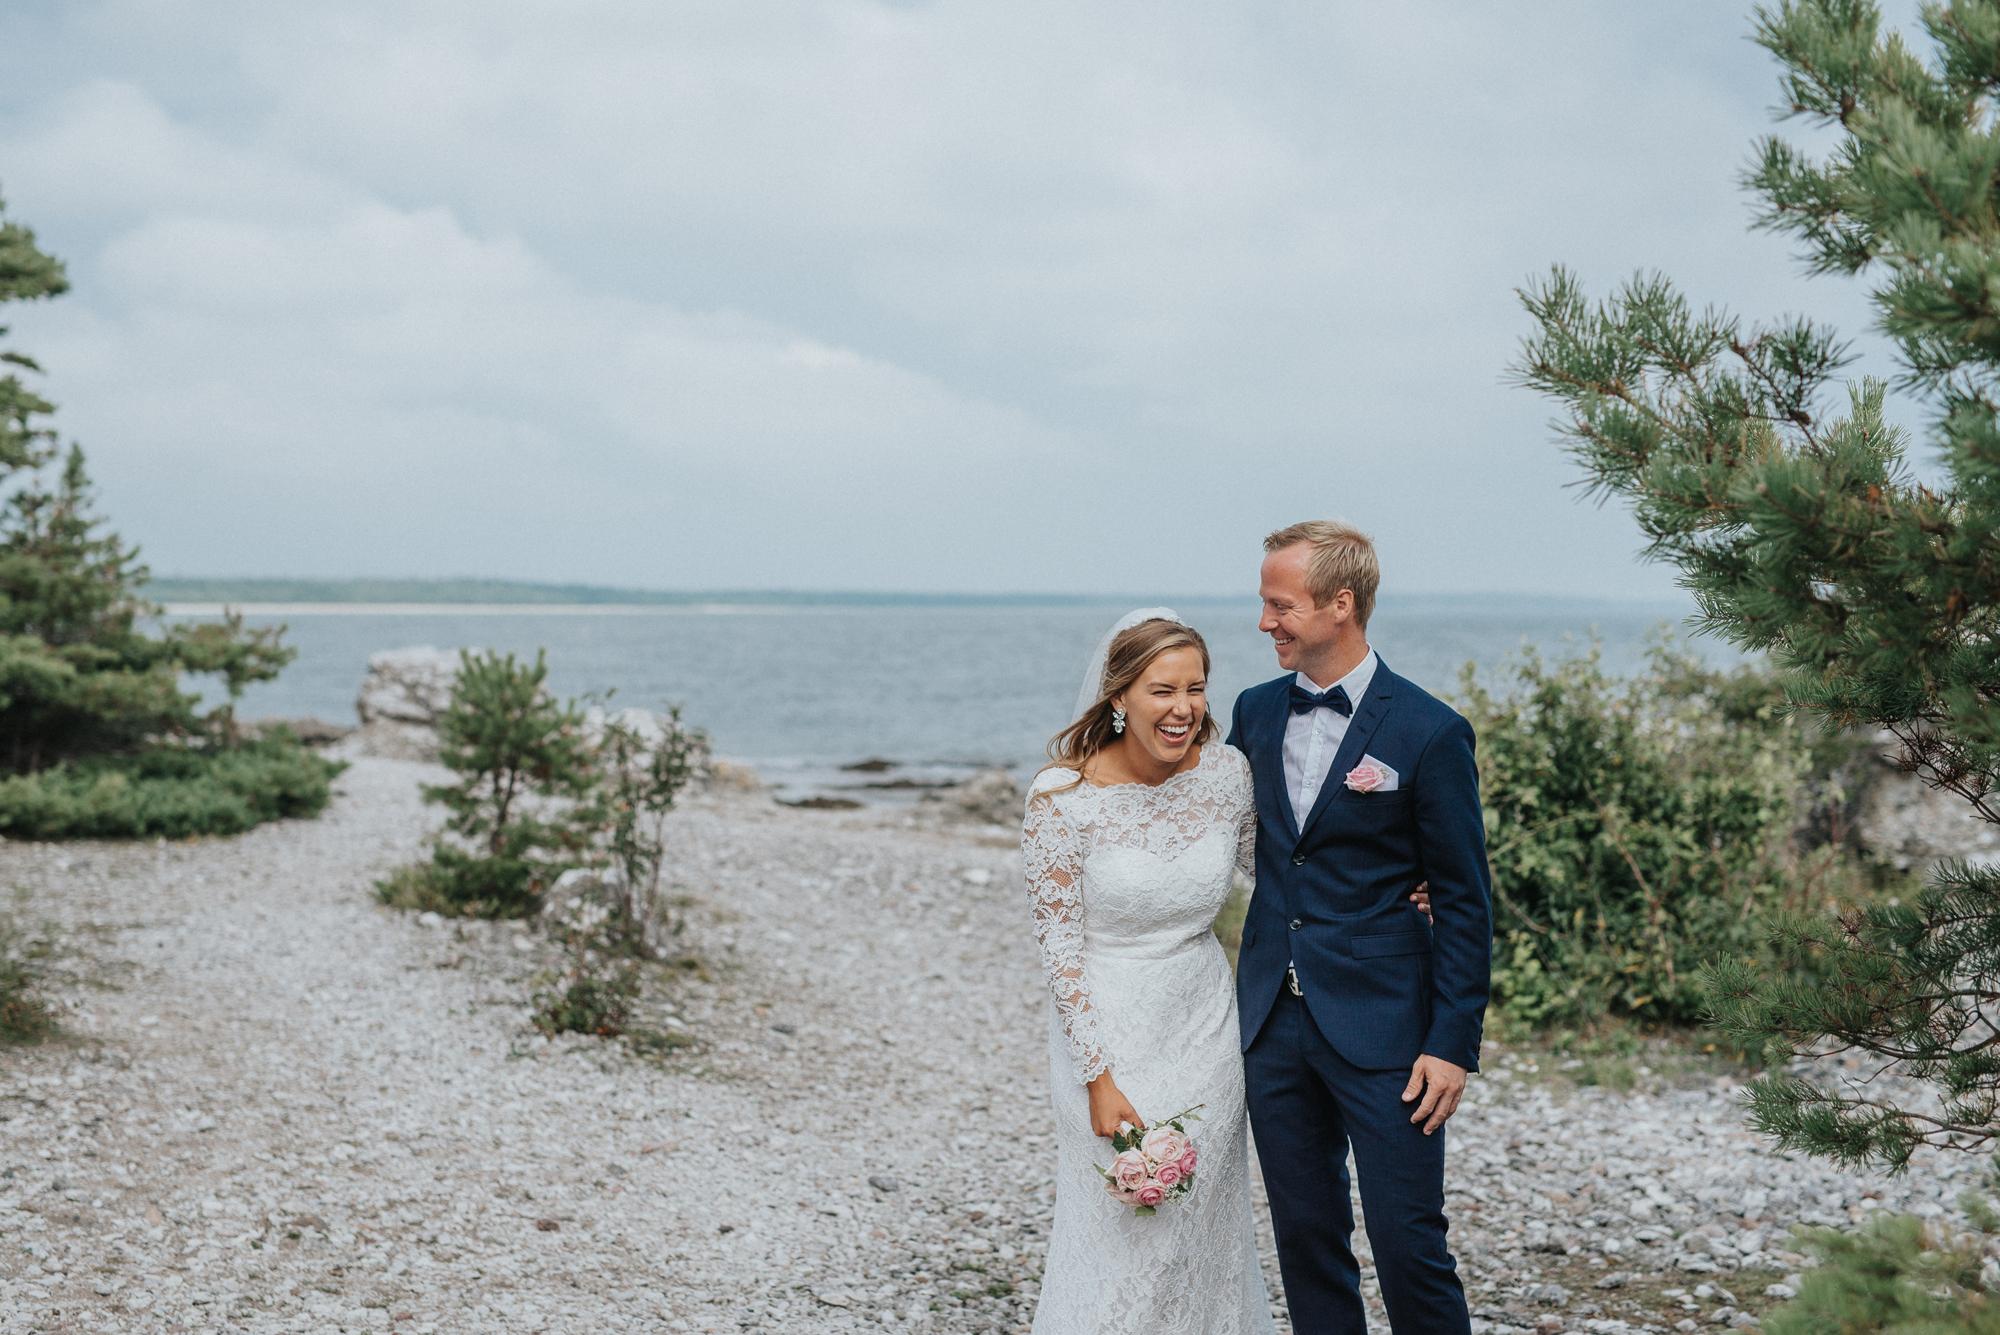 024-bröllopsfotograf-folhammar-gotland-neas-fotografi.jpg